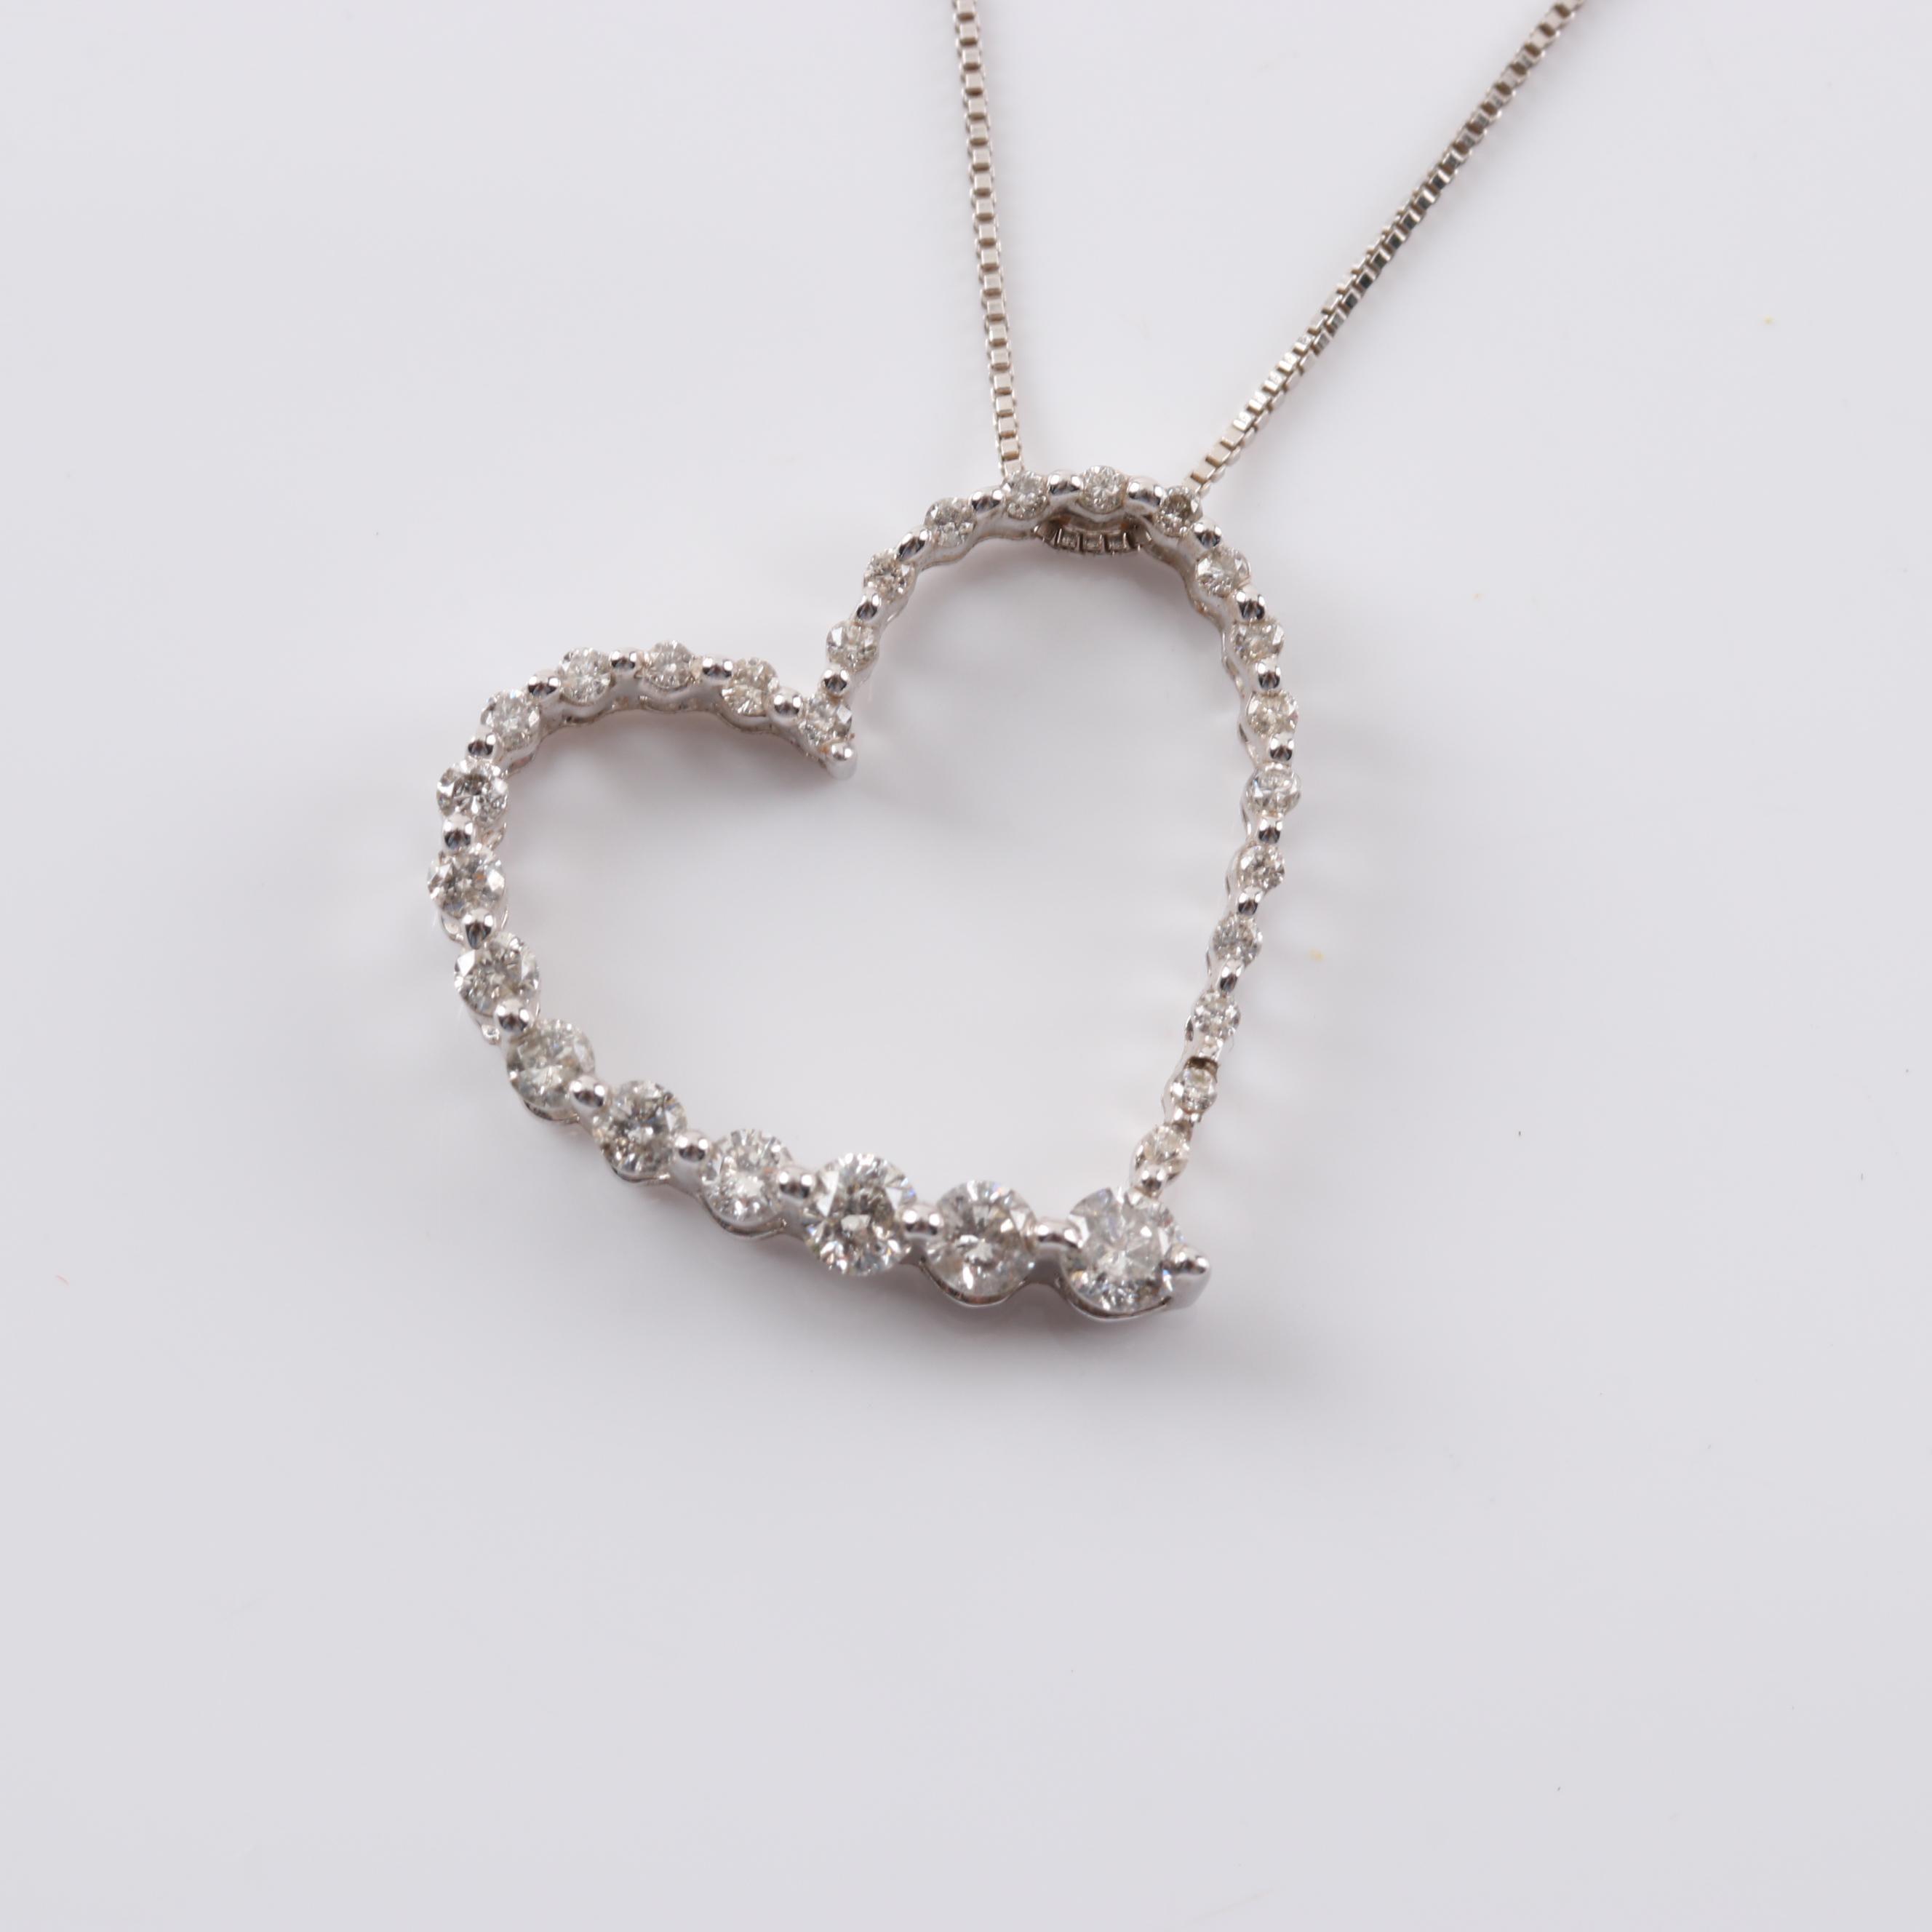 10K White Gold Open Heart Diamond Heart Pendant Necklace